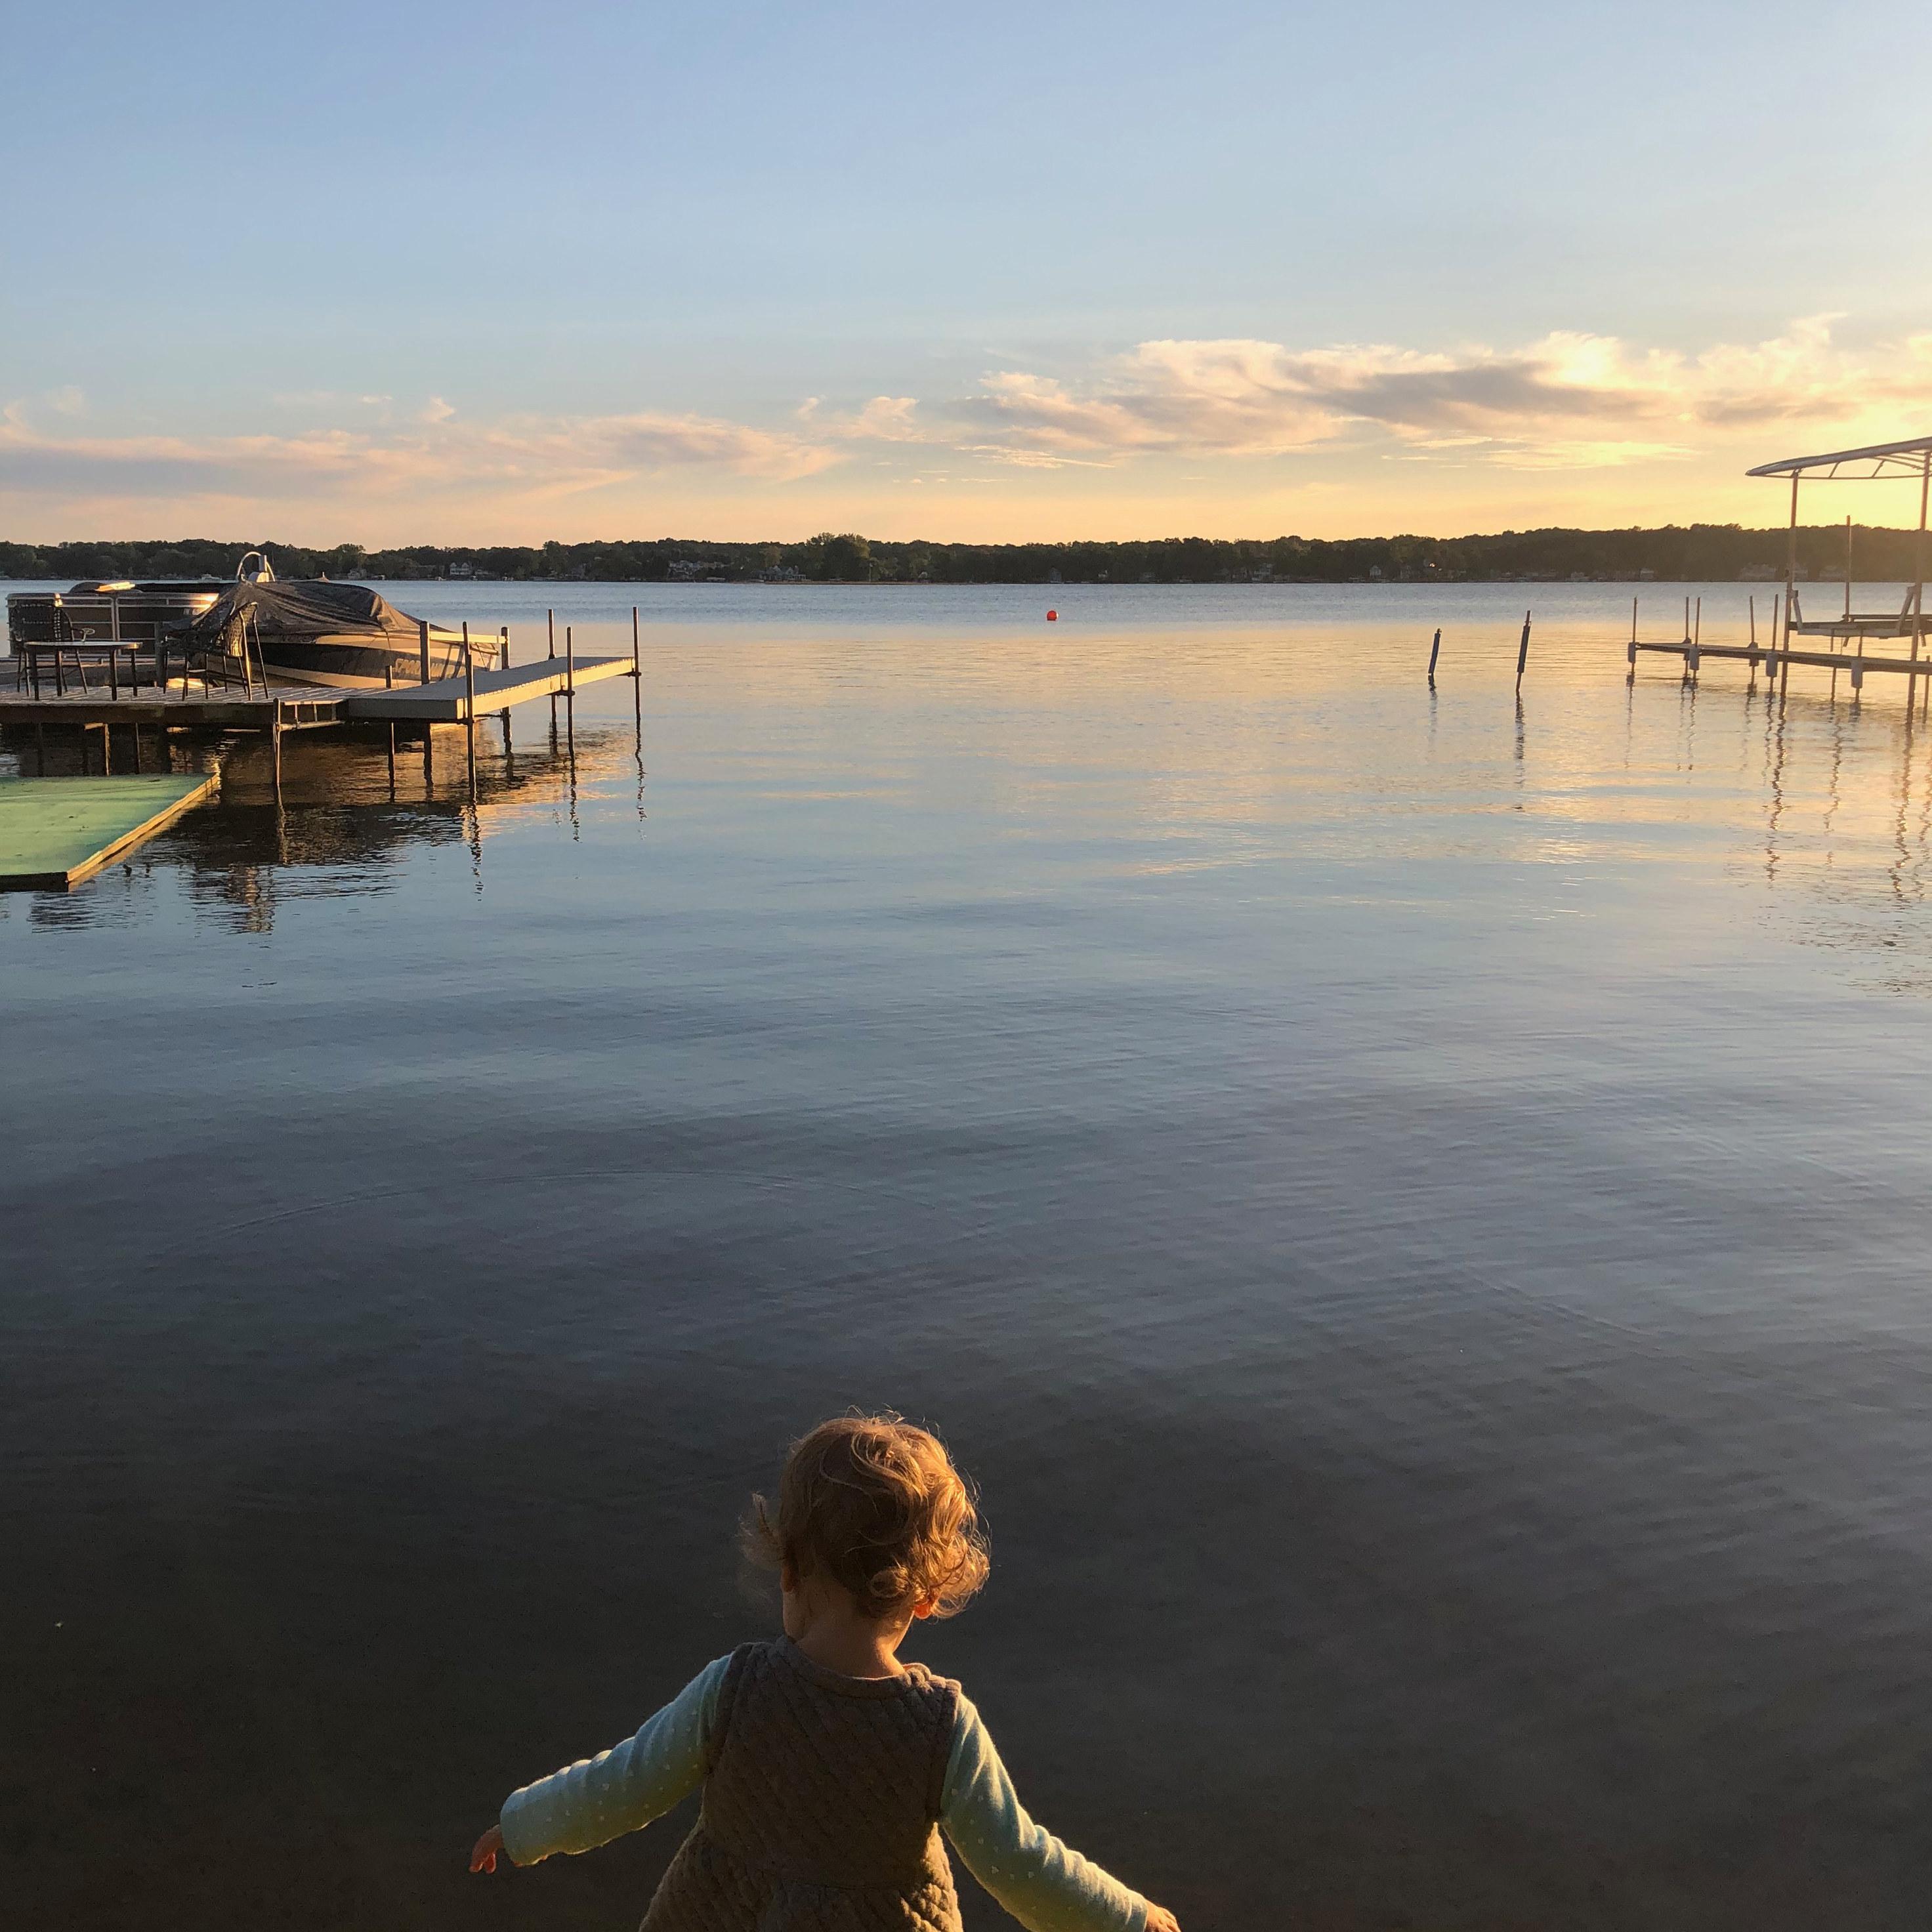 A toddler at the edge of a lake at sunset